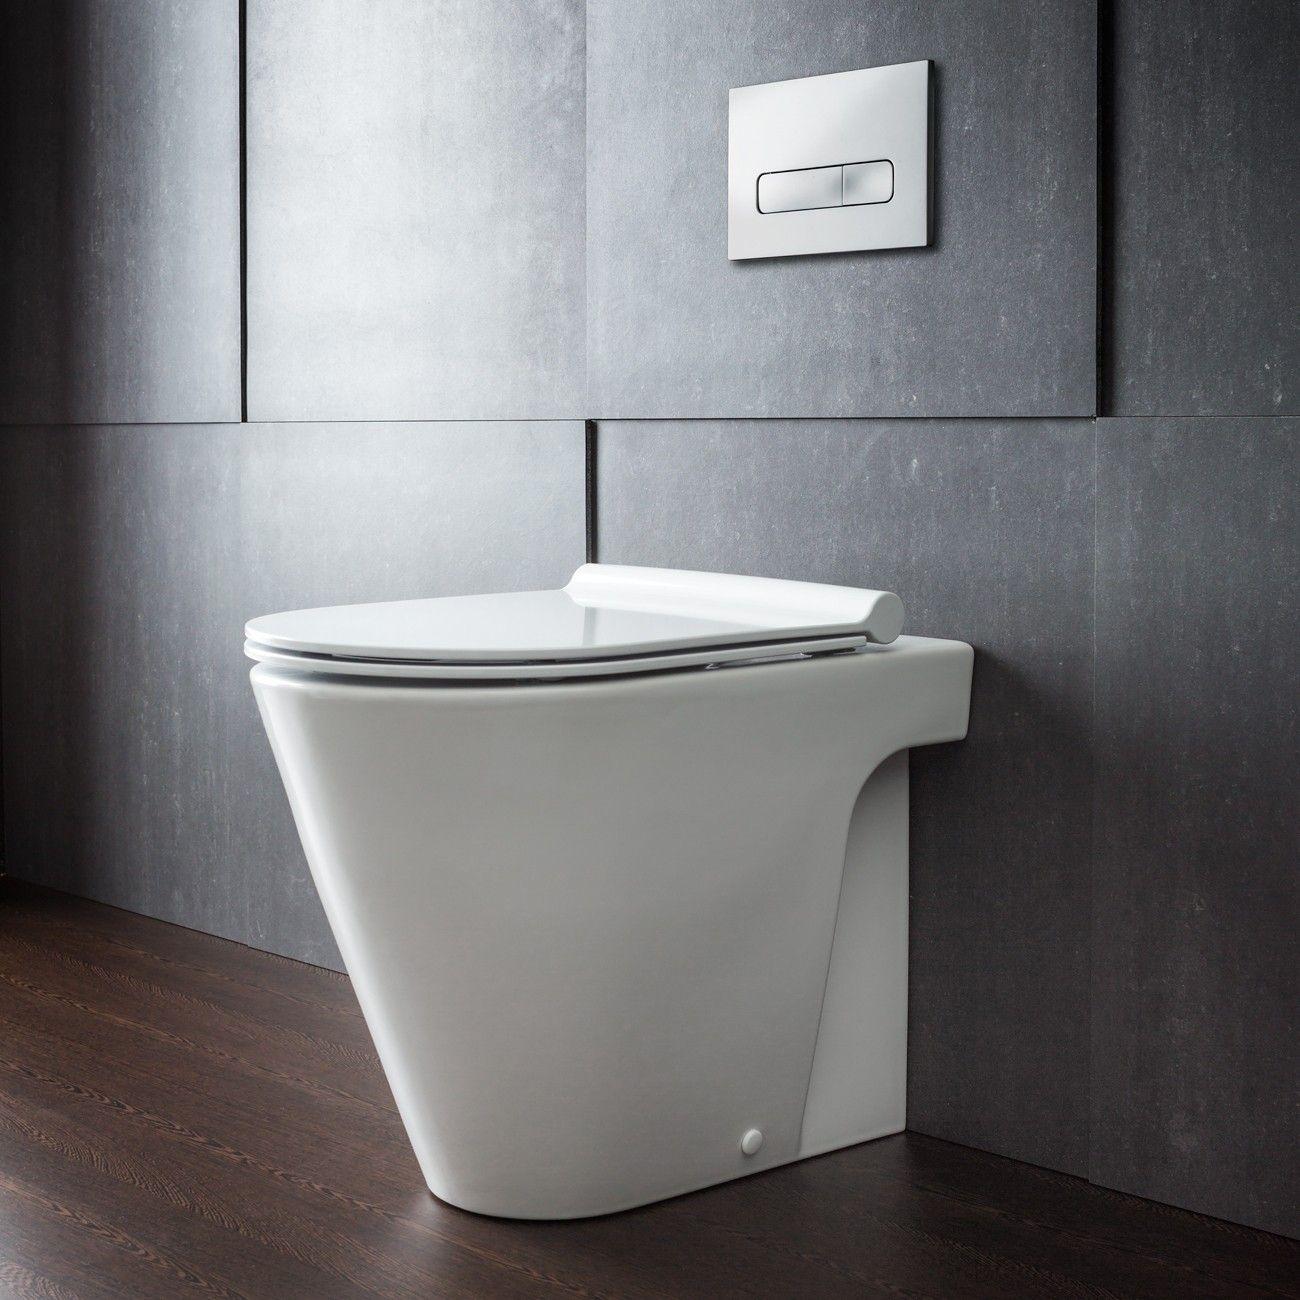 catalano zero  floor mount toilet pan with slim seat  - a revolution in toilet design the zero  floor mount toilet by catalanois a clean and contemporary premium toilet designed on a 'rounded matrix'